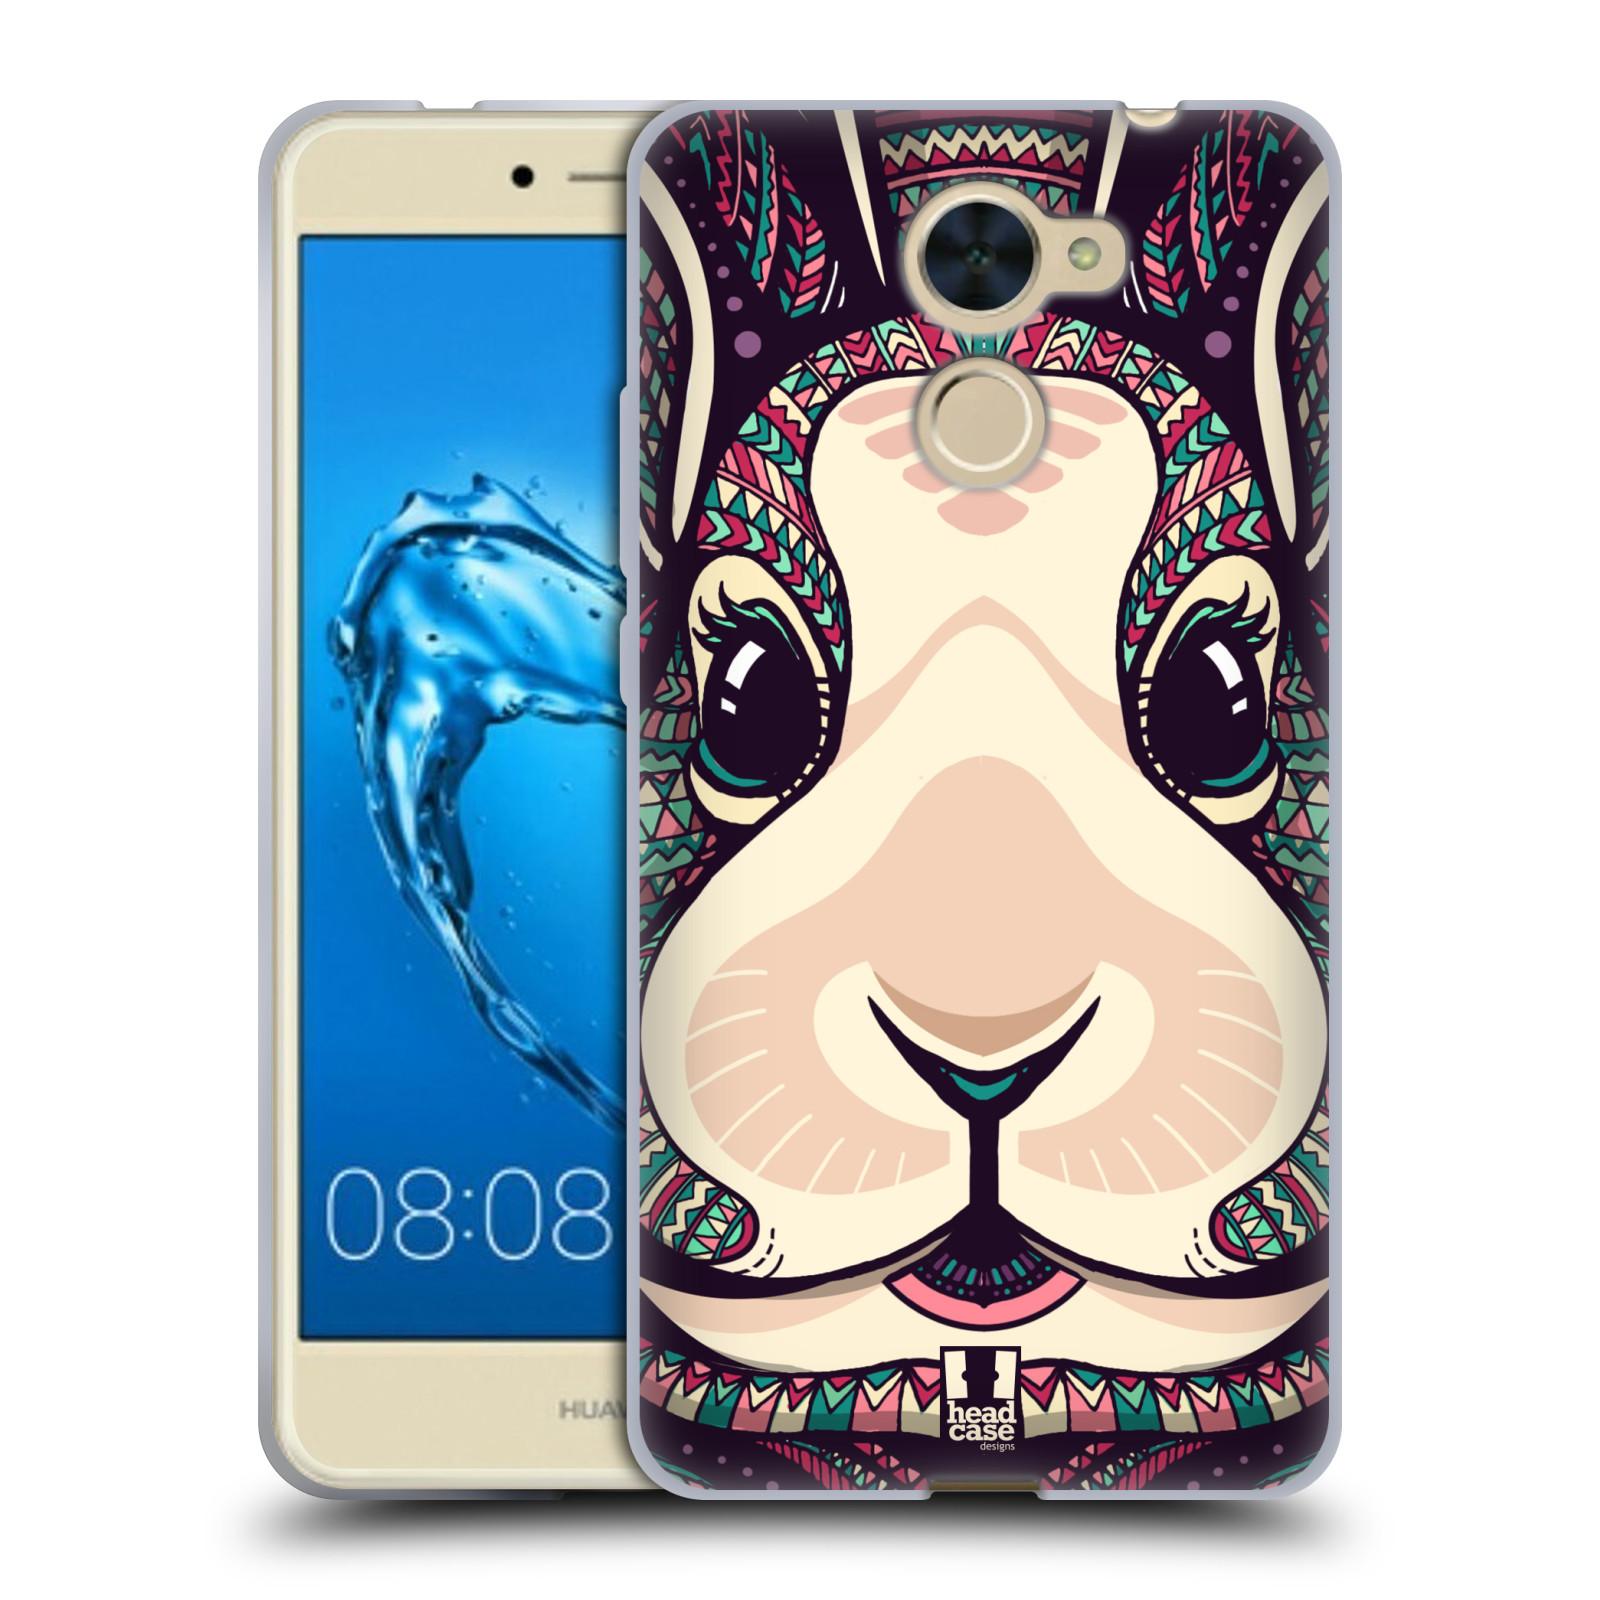 Silikonové pouzdro na mobil Huawei Y7 - Head Case - AZTEC ZAJÍČEK